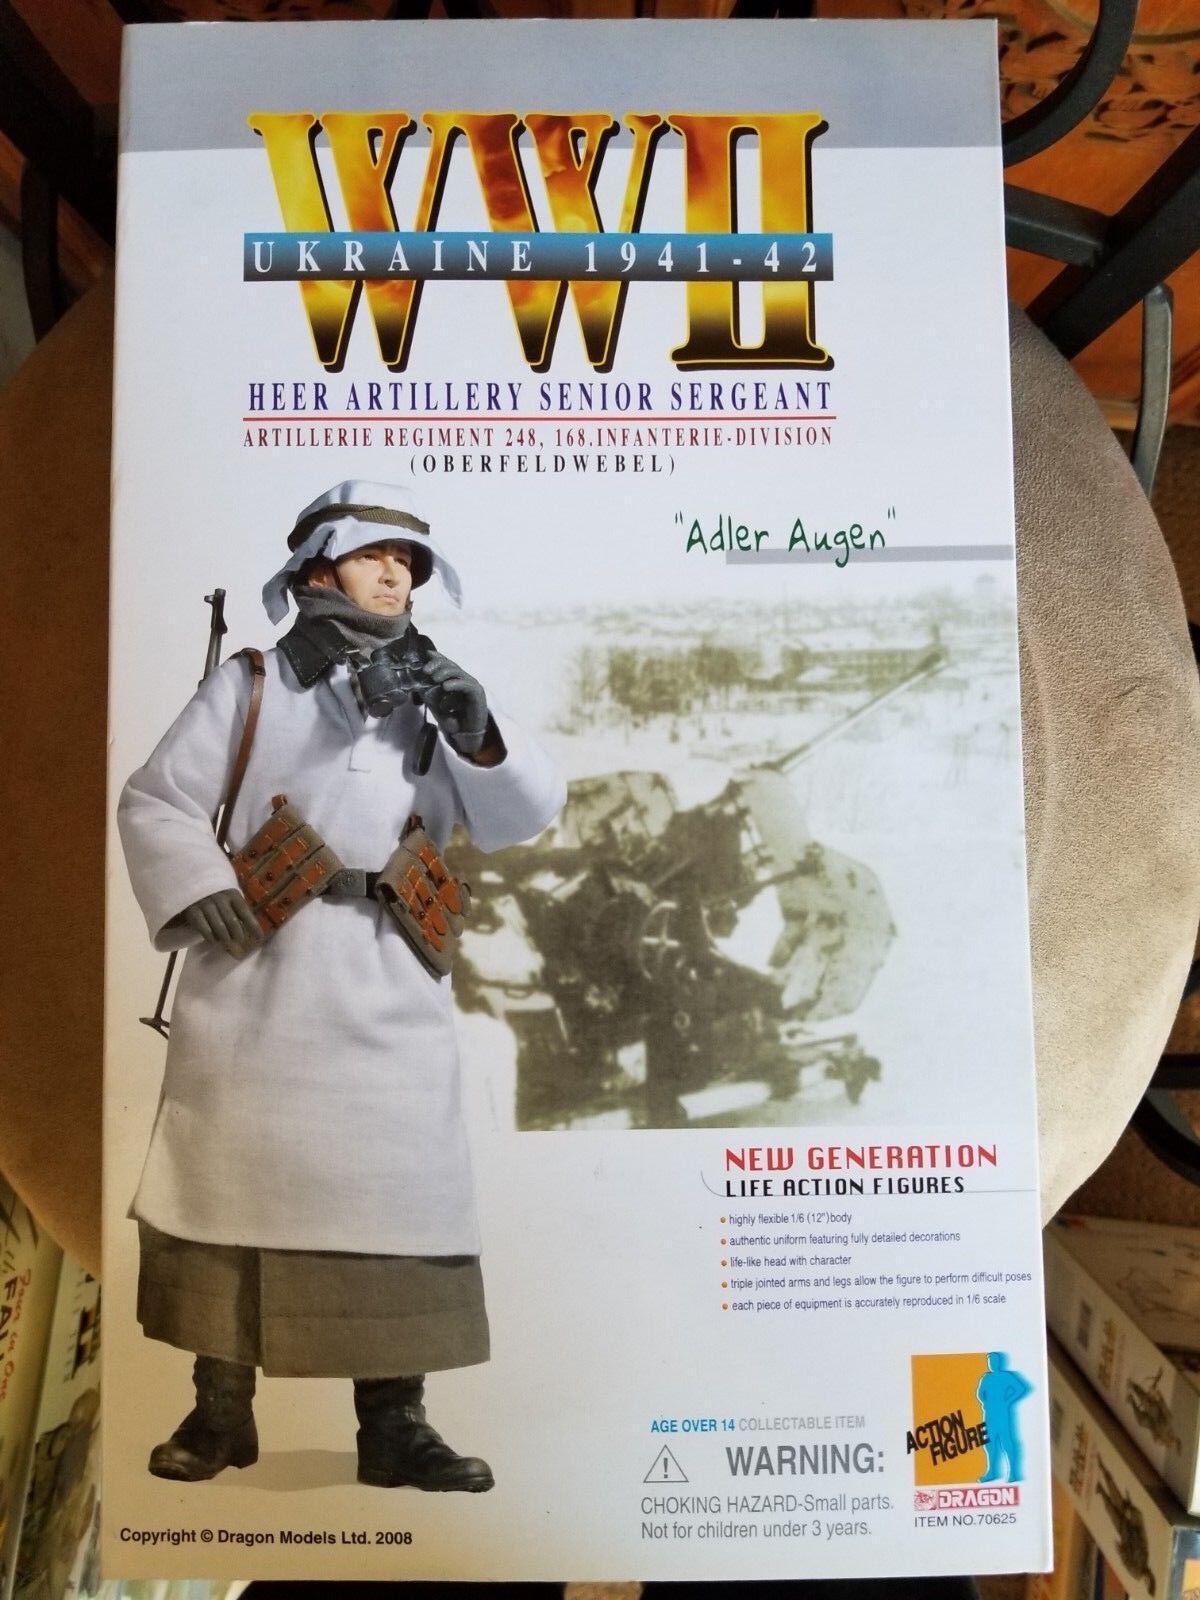 DRAGON 1 6 Scale Deuxième Guerre Mondiale Allemand Adler Augen HEER artillerie Ukraine 1941-1942 70625